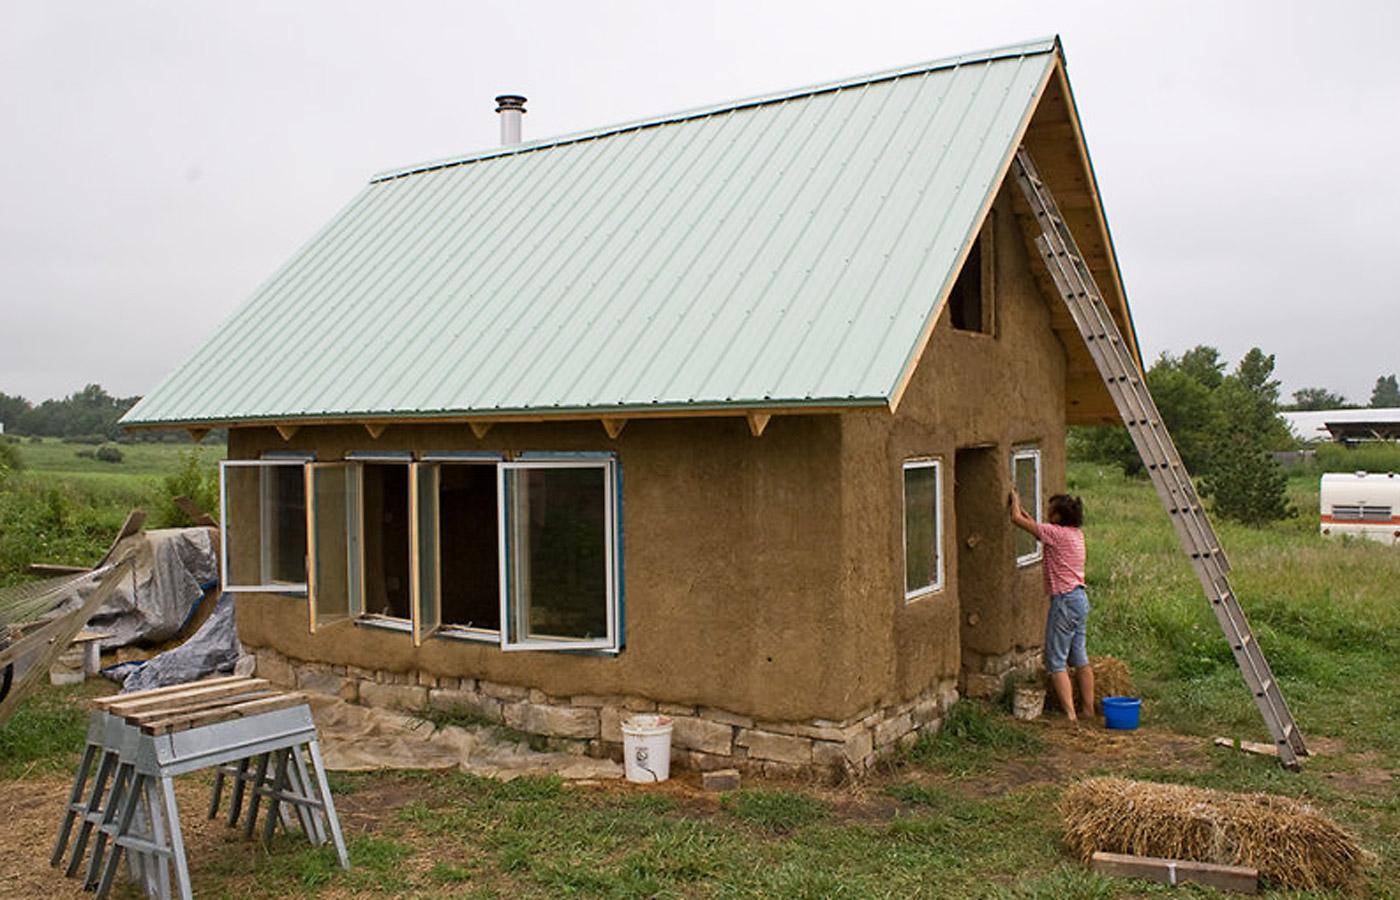 cob home, cob house, corn cob house